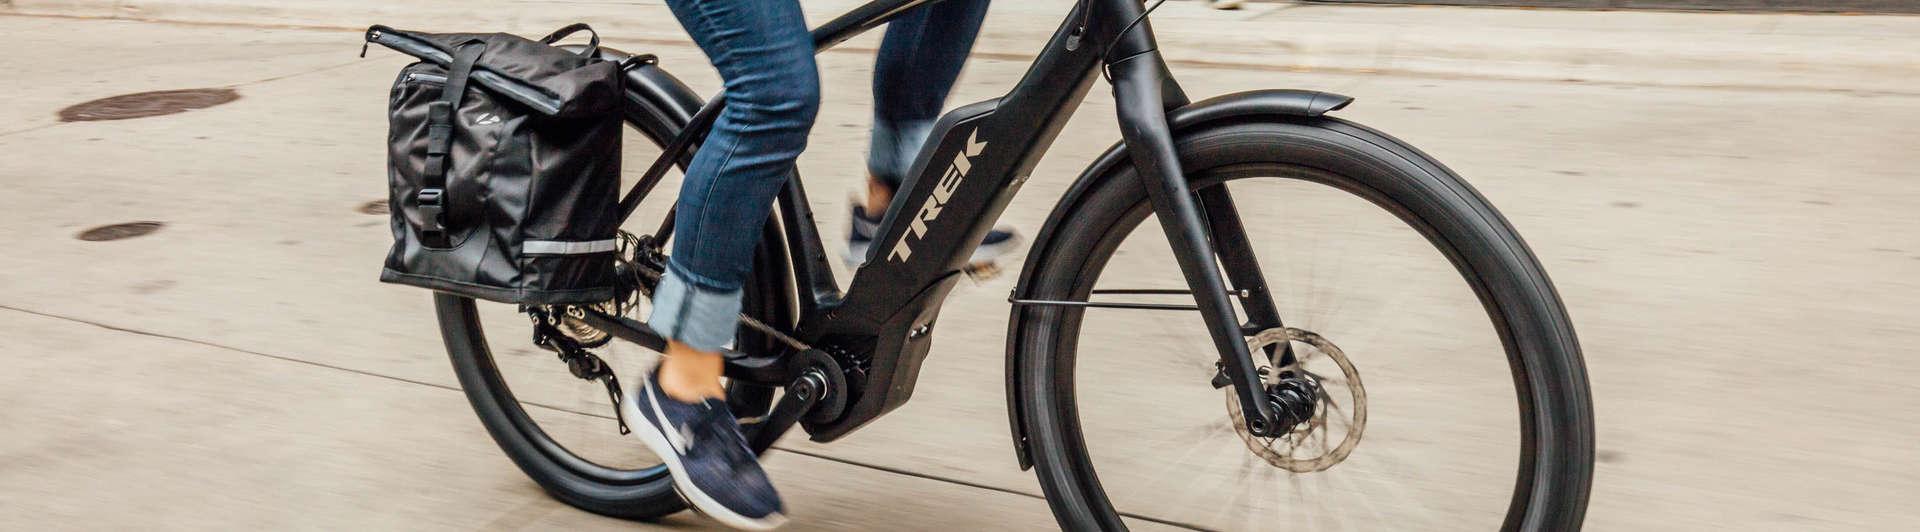 Electric Bikes | E-Bikes